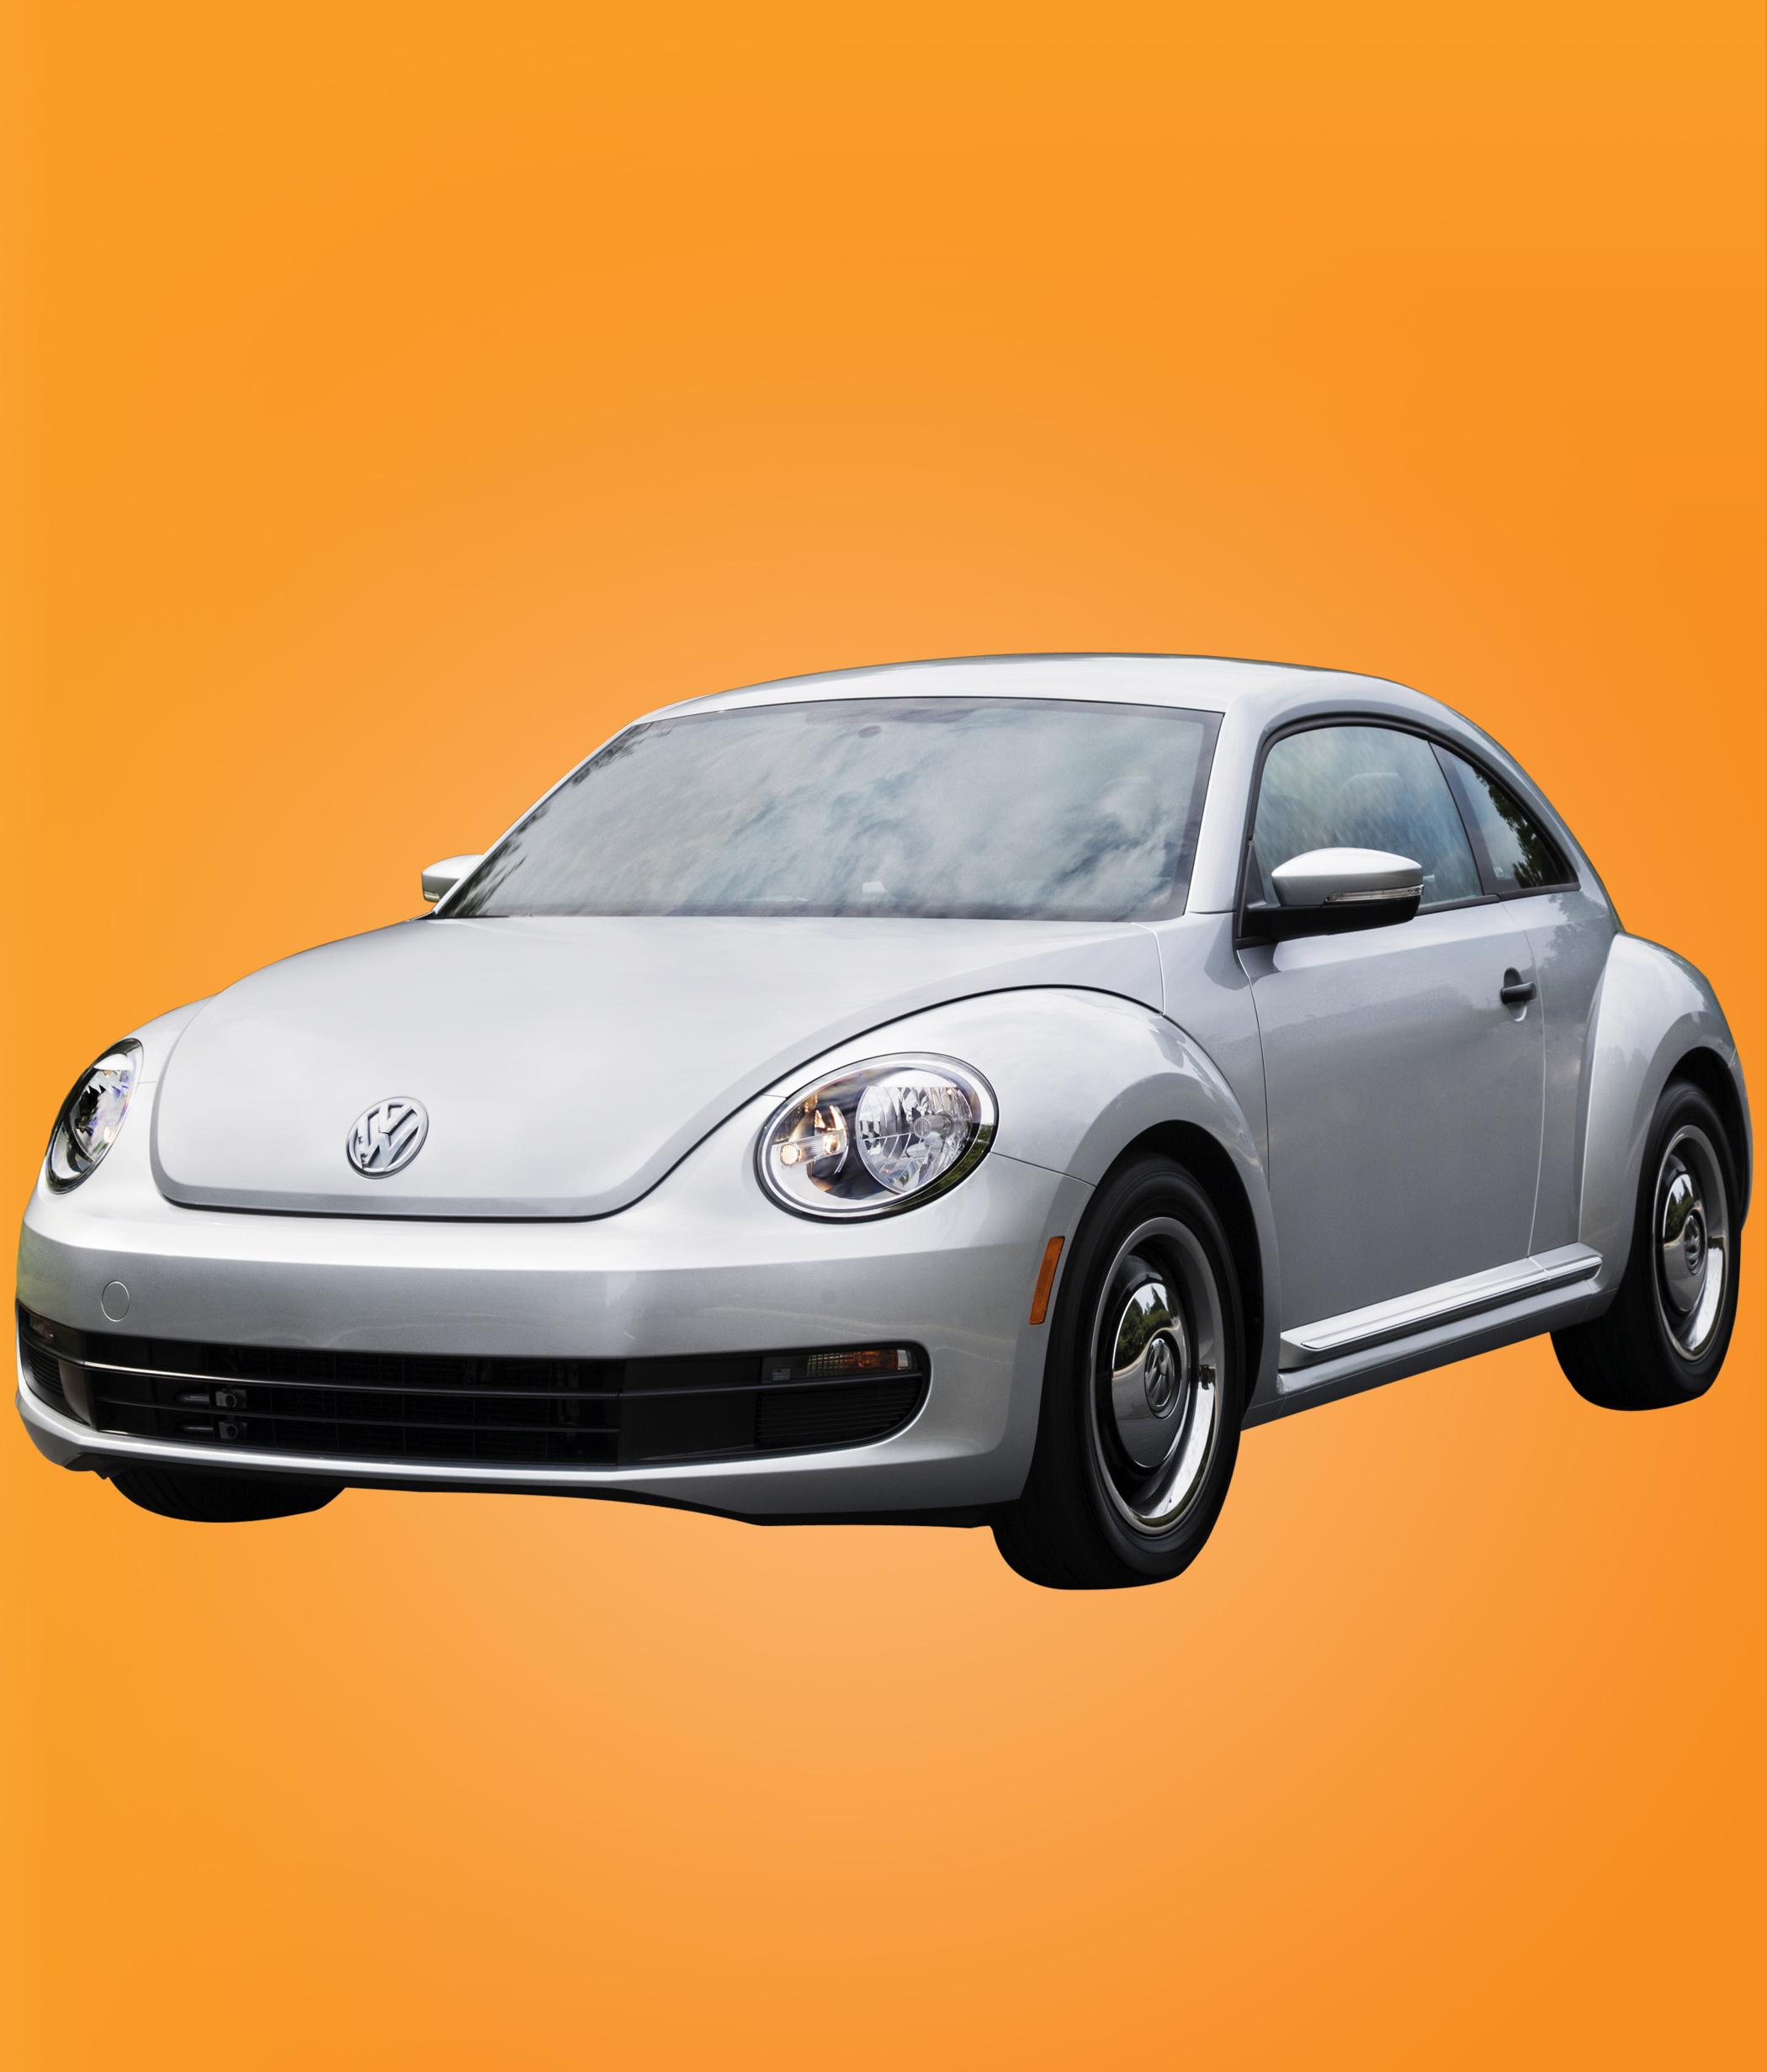 Courtesy of VW